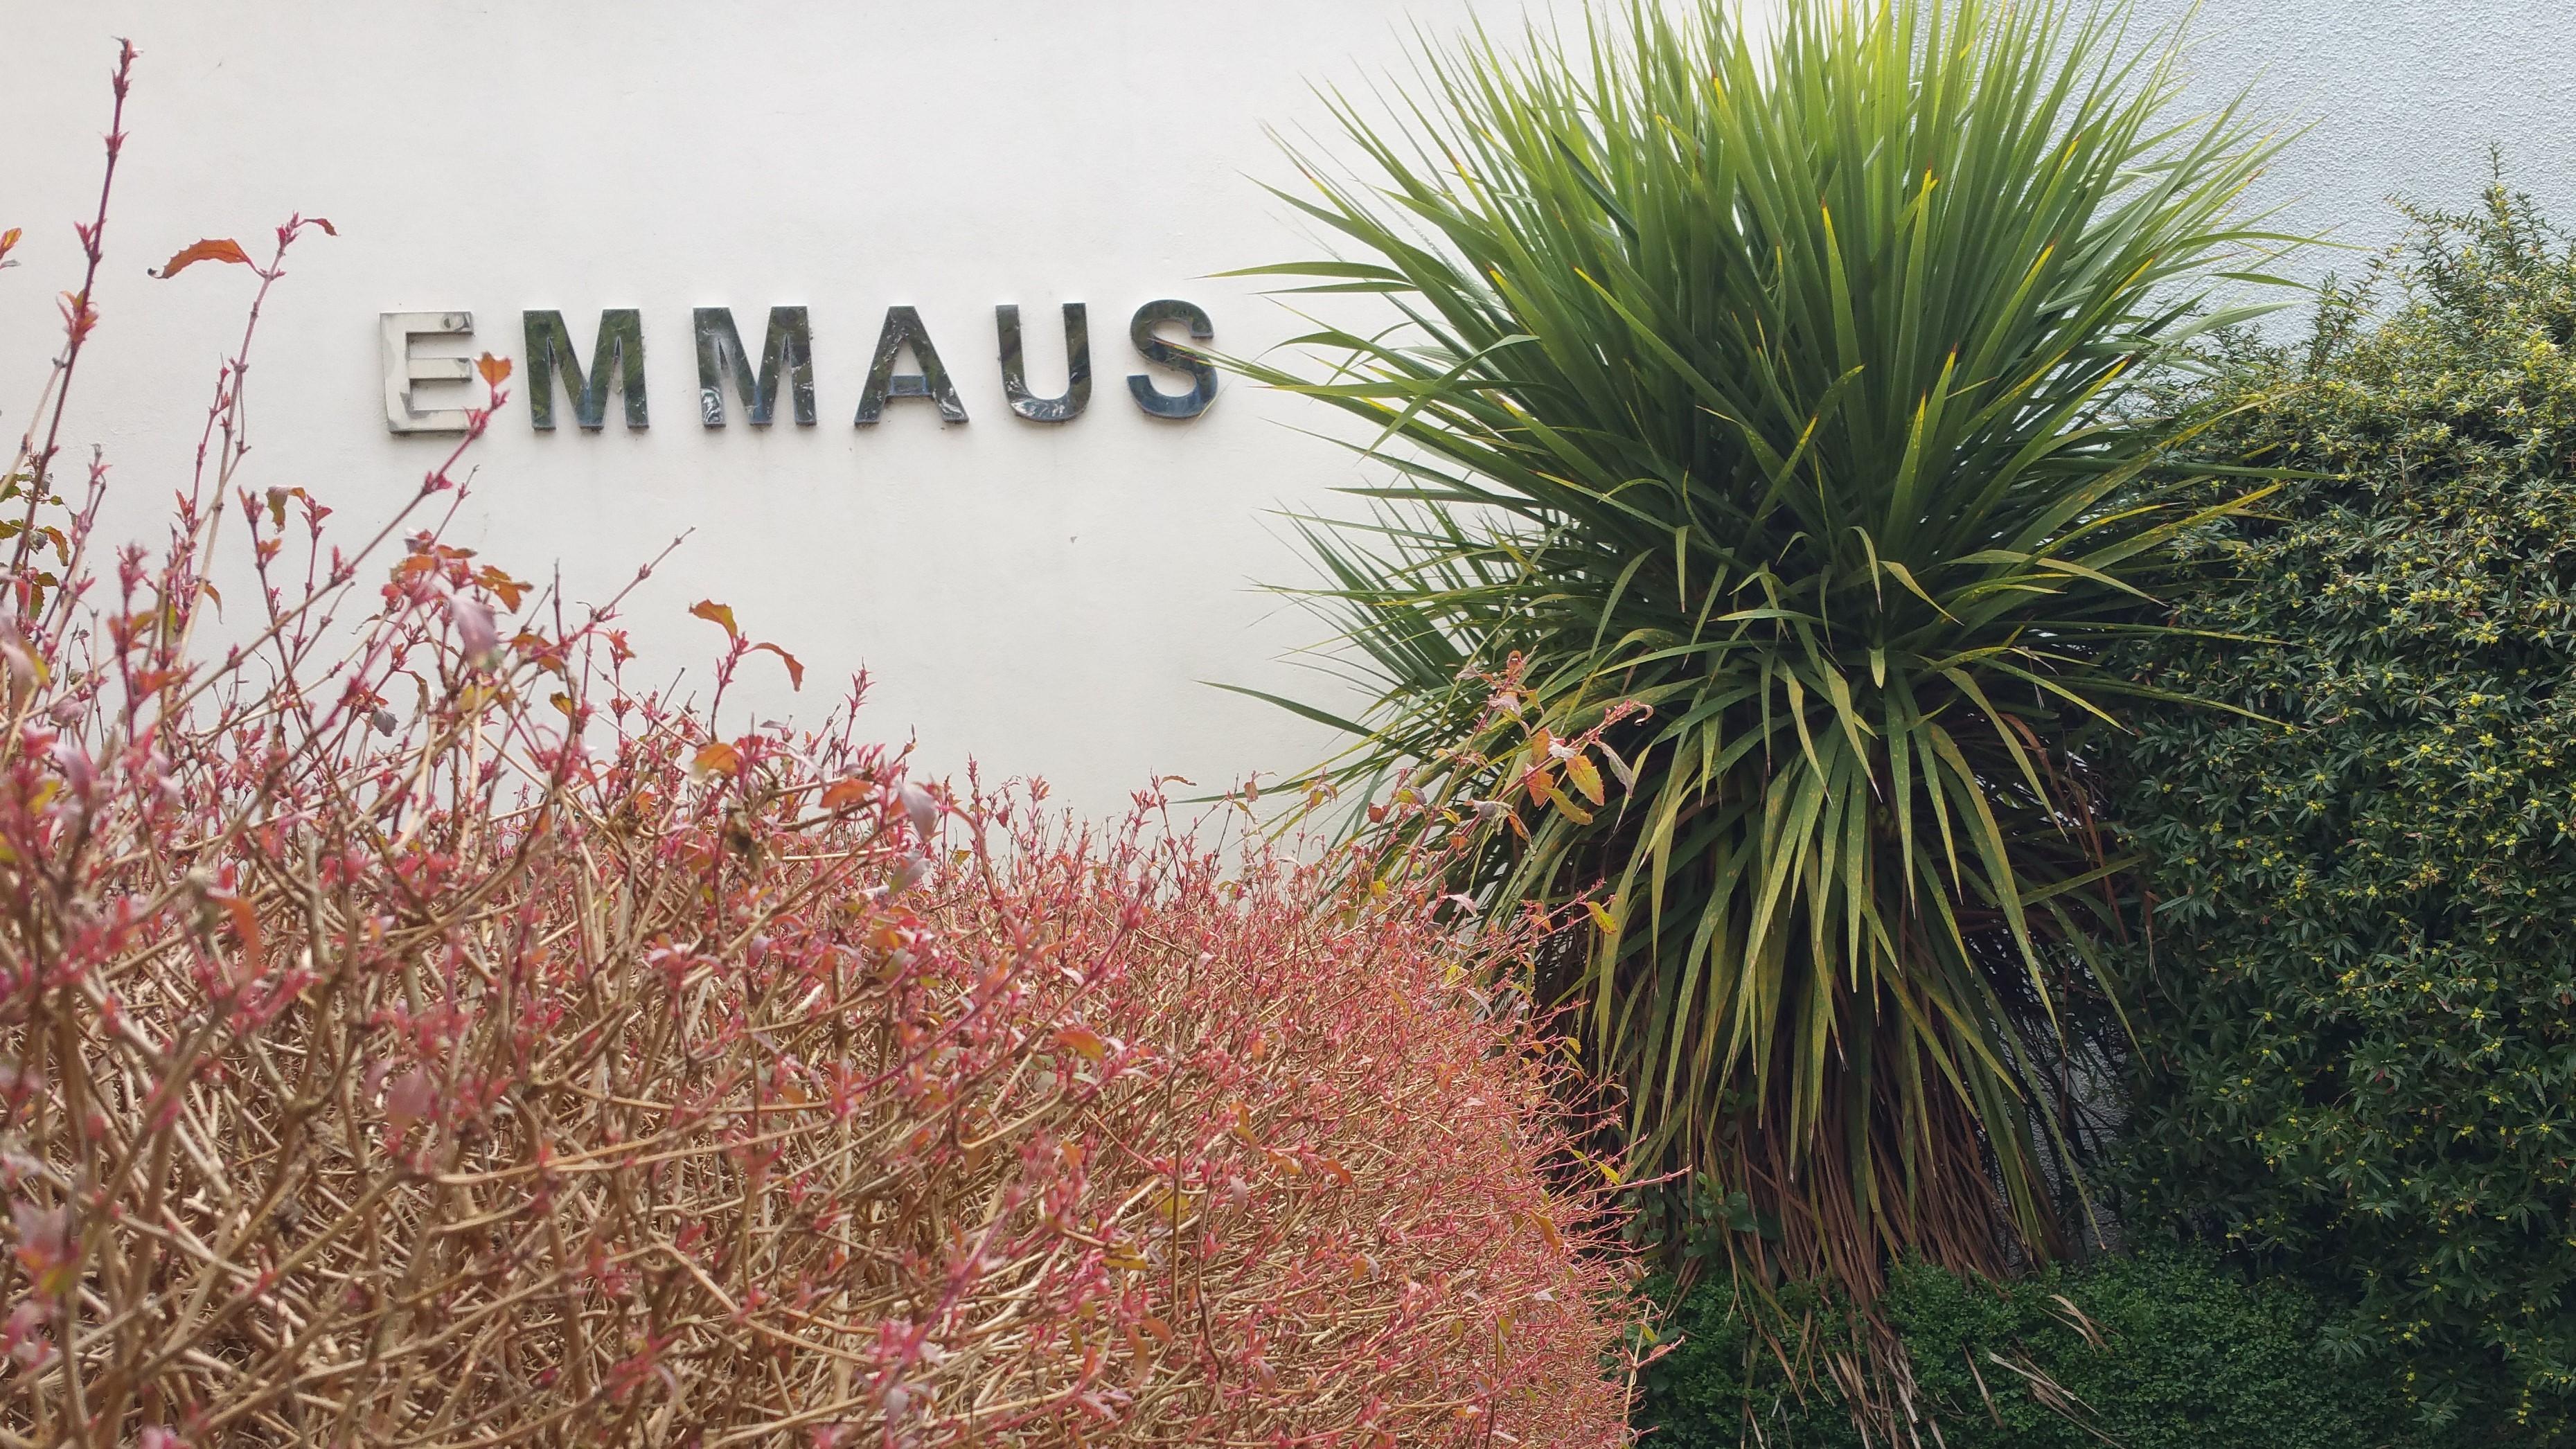 Emmaus Centre, Swords, Co Dublin